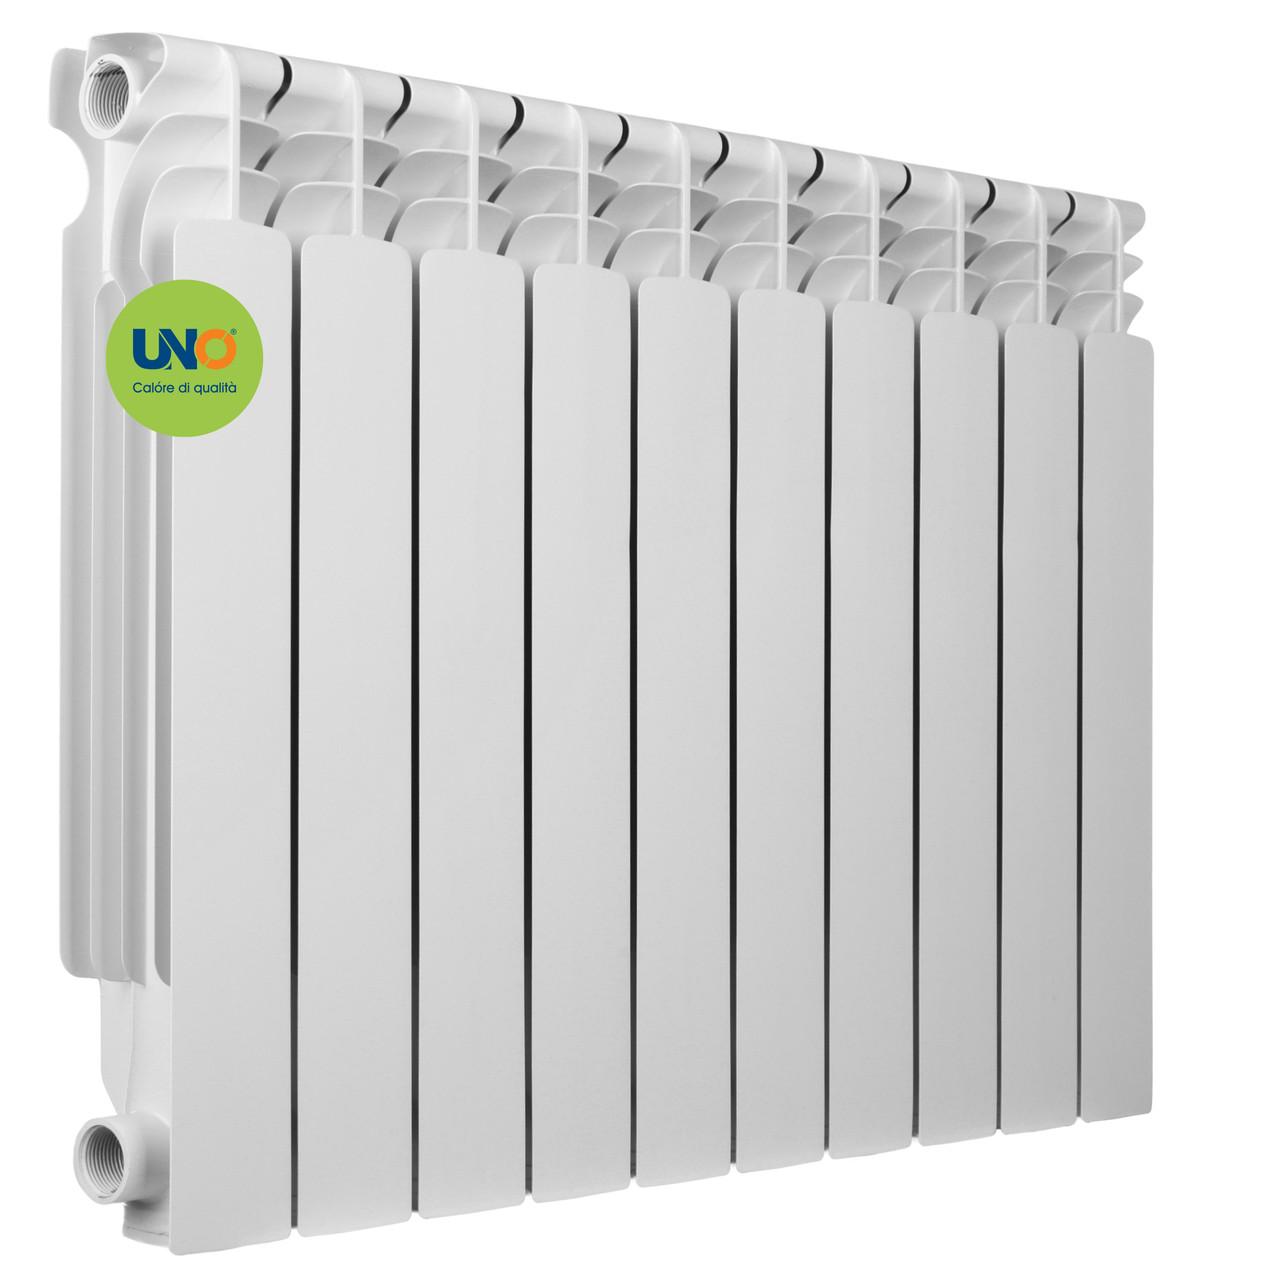 Алюминиевый радиатор UNO-RAVELLO 500/100